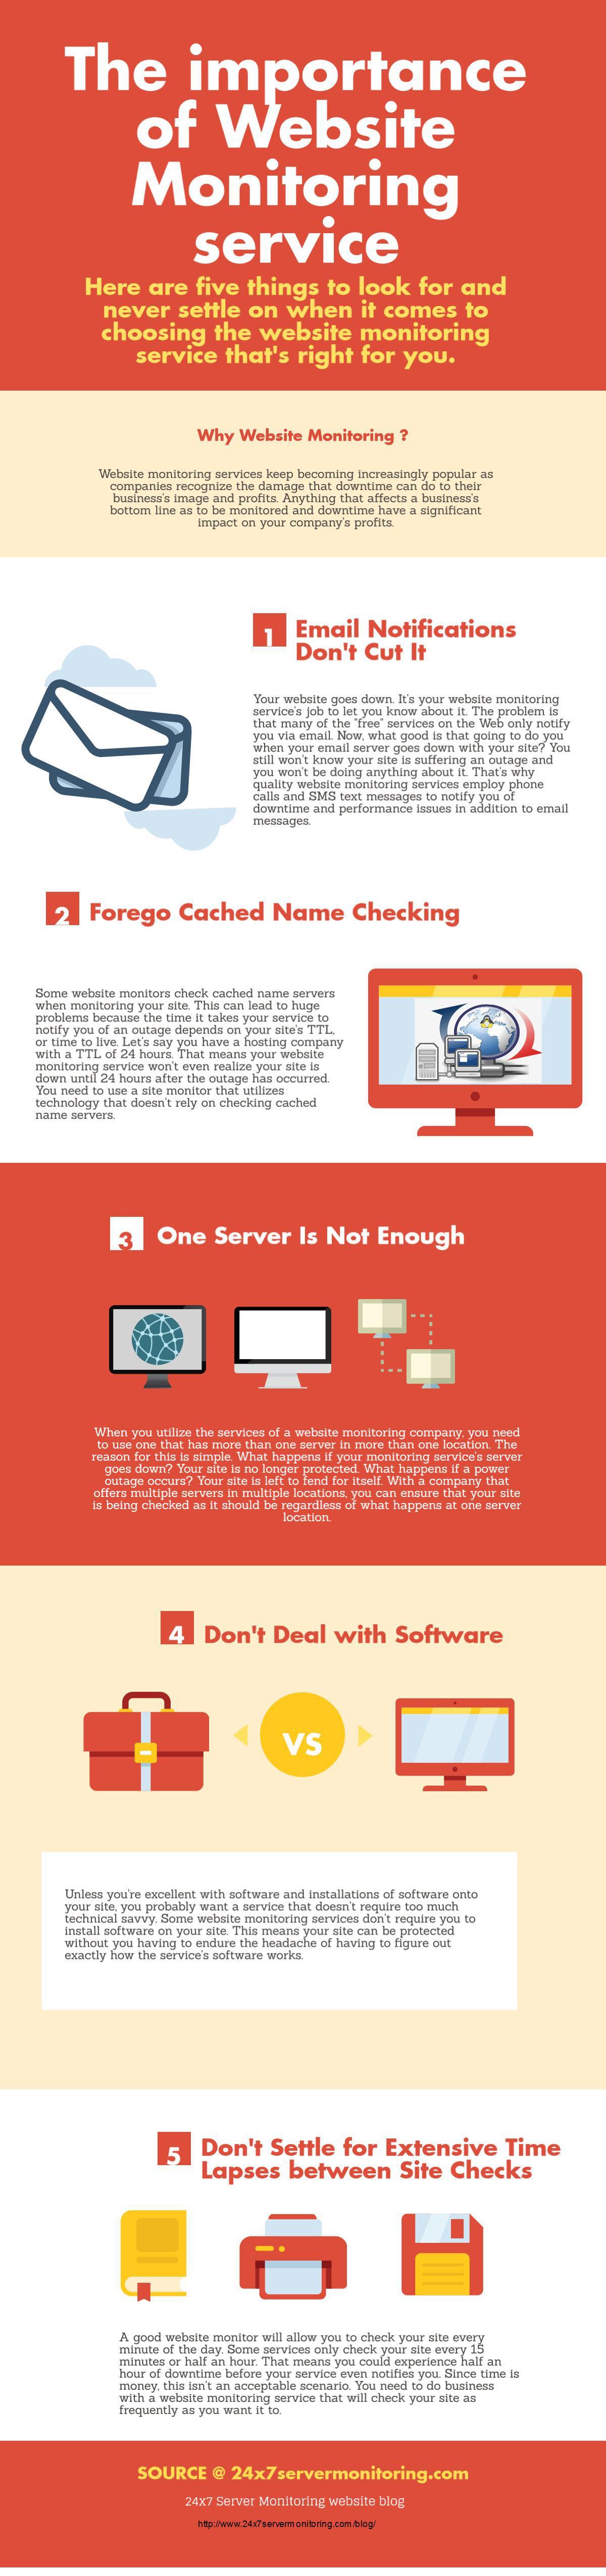 24x7servermonit websitemonitoring11